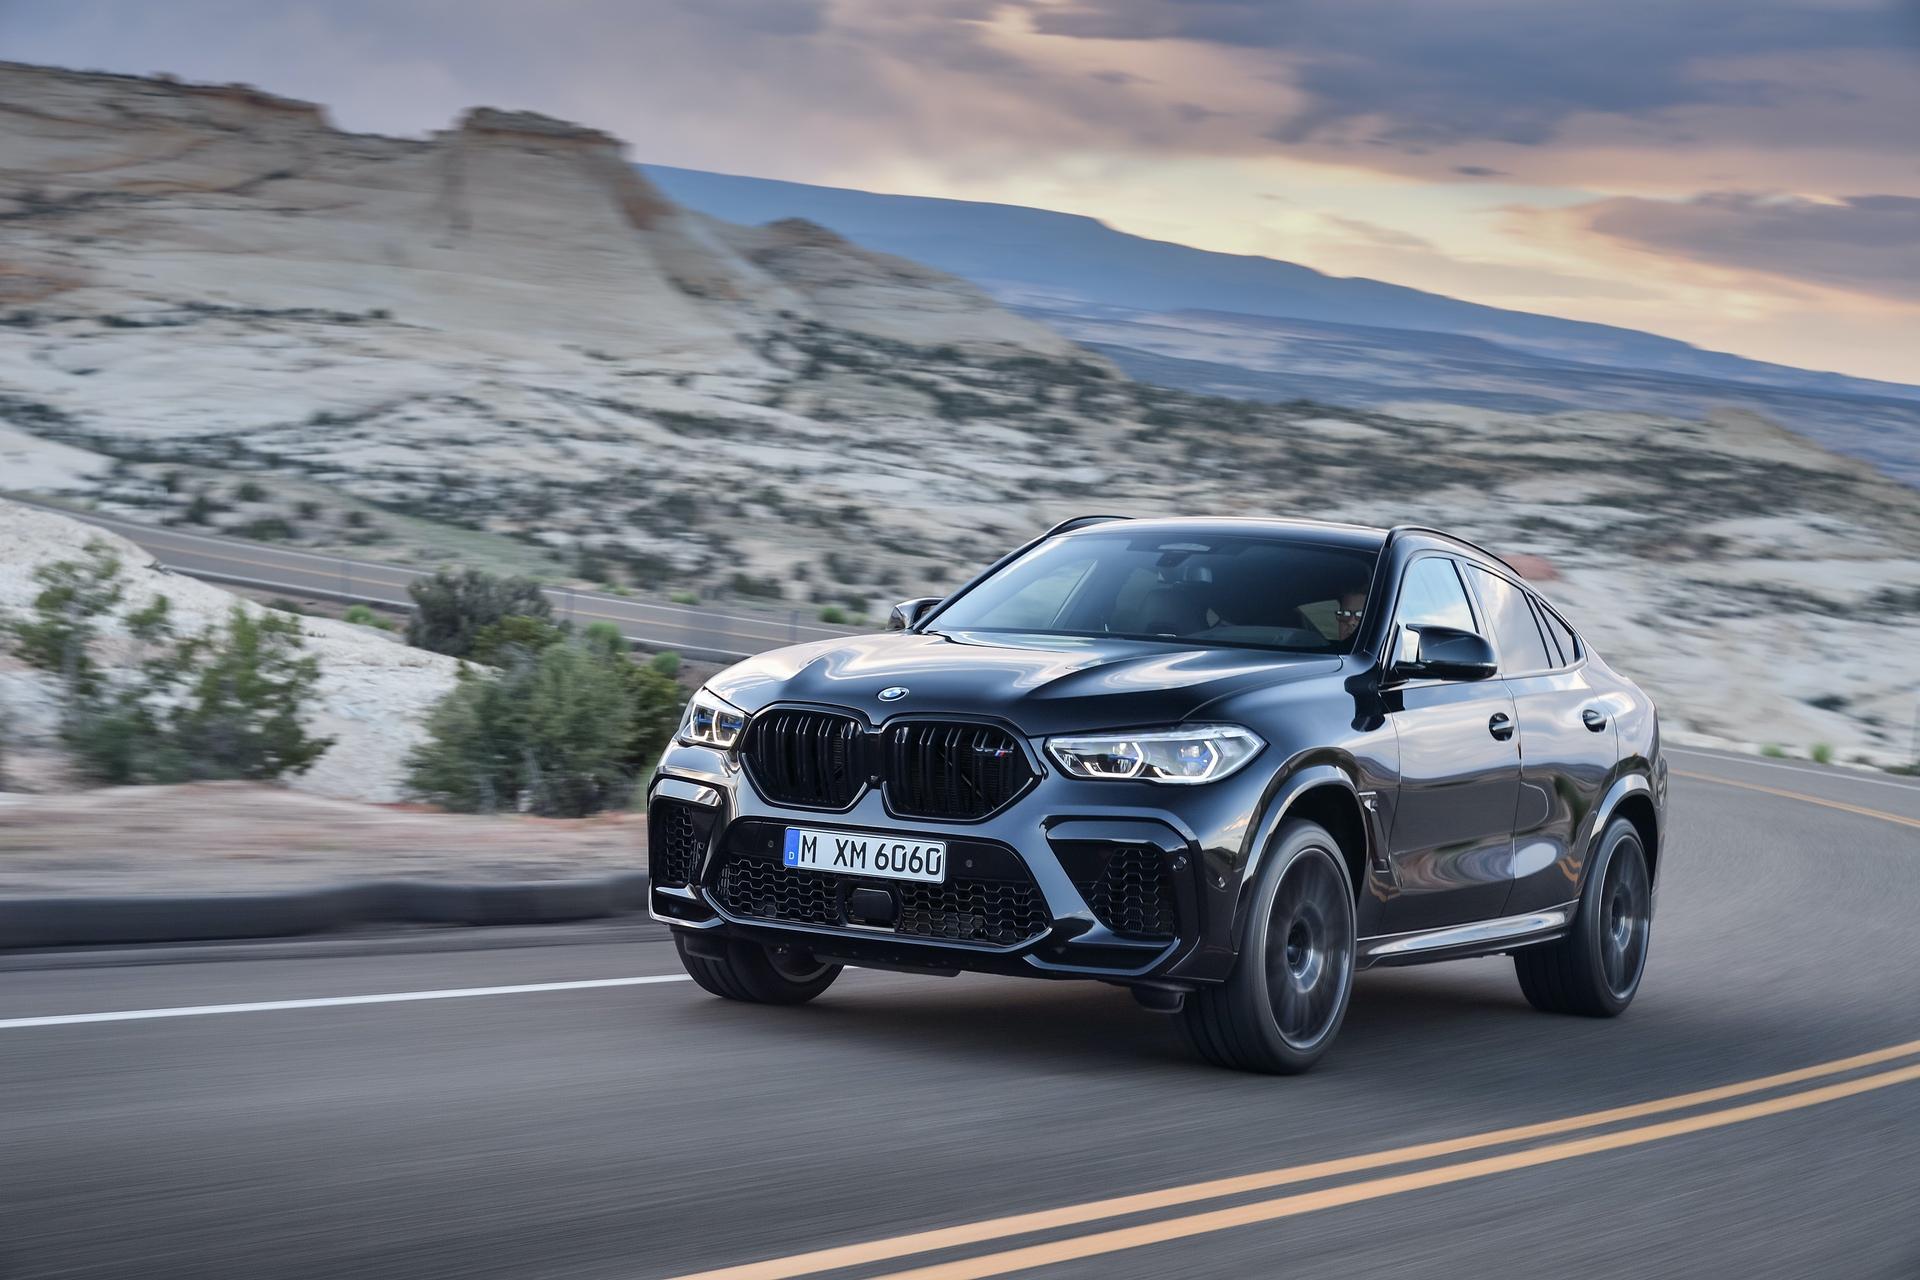 BMW X6 M Competition exterior design 2